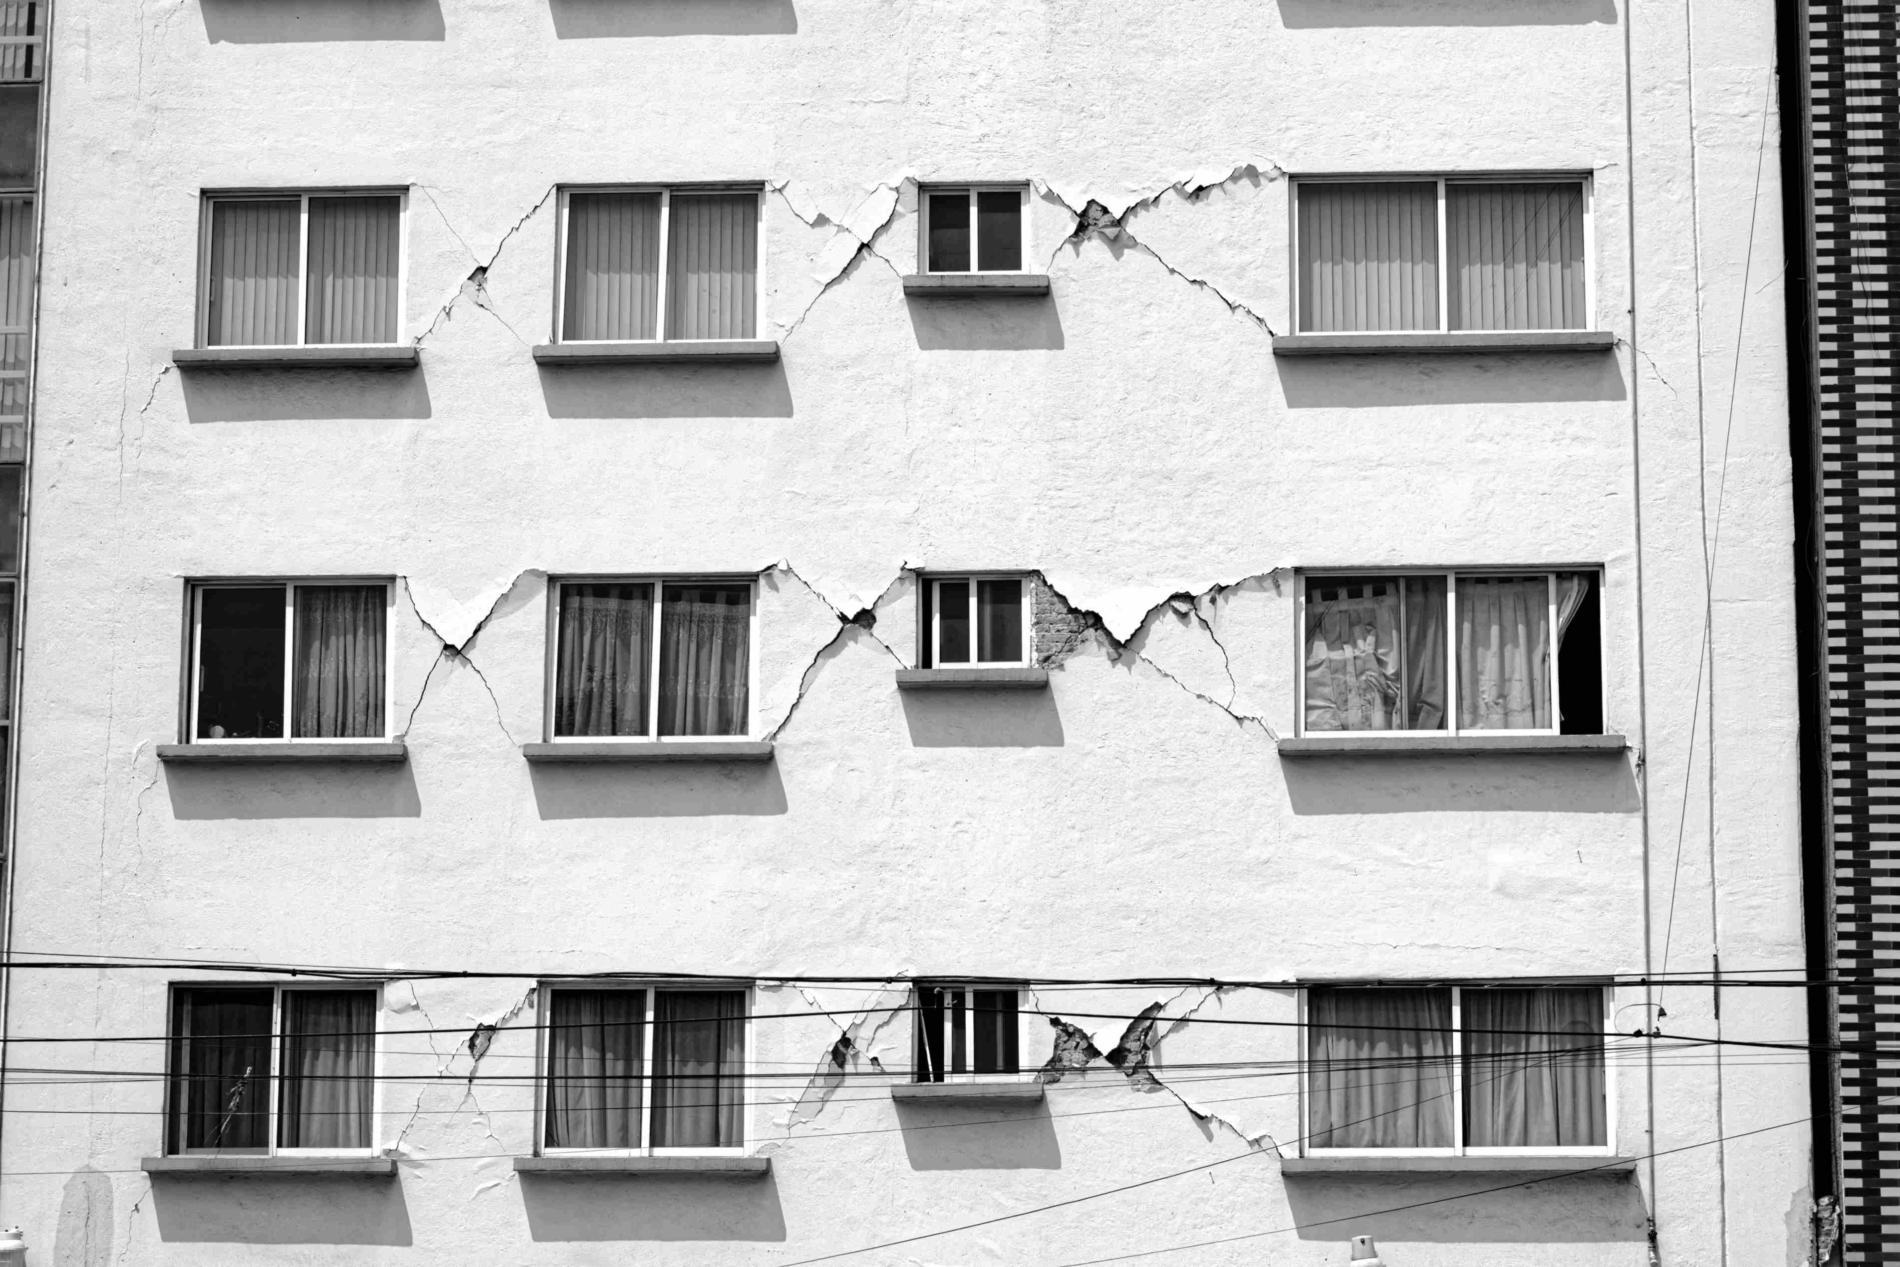 Edificio sismo resistente Blog Grupo Domus